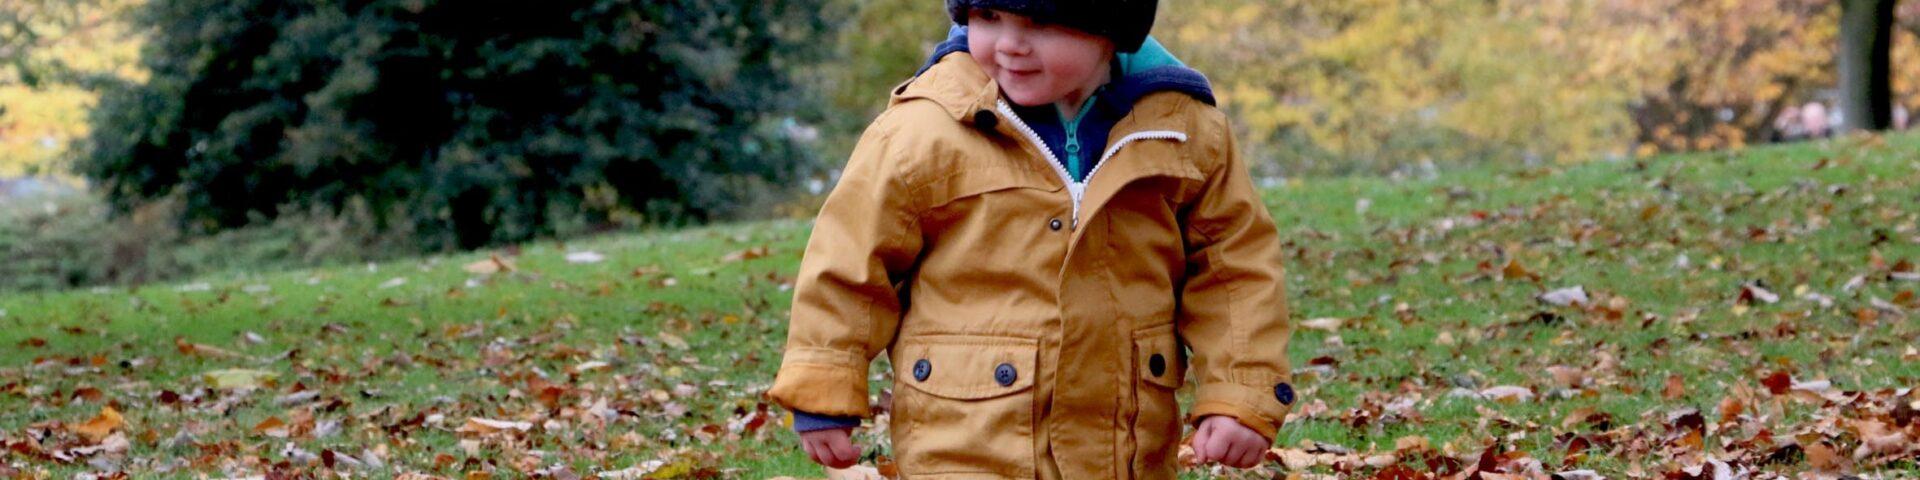 child in bobble hat walking in autumn leaves